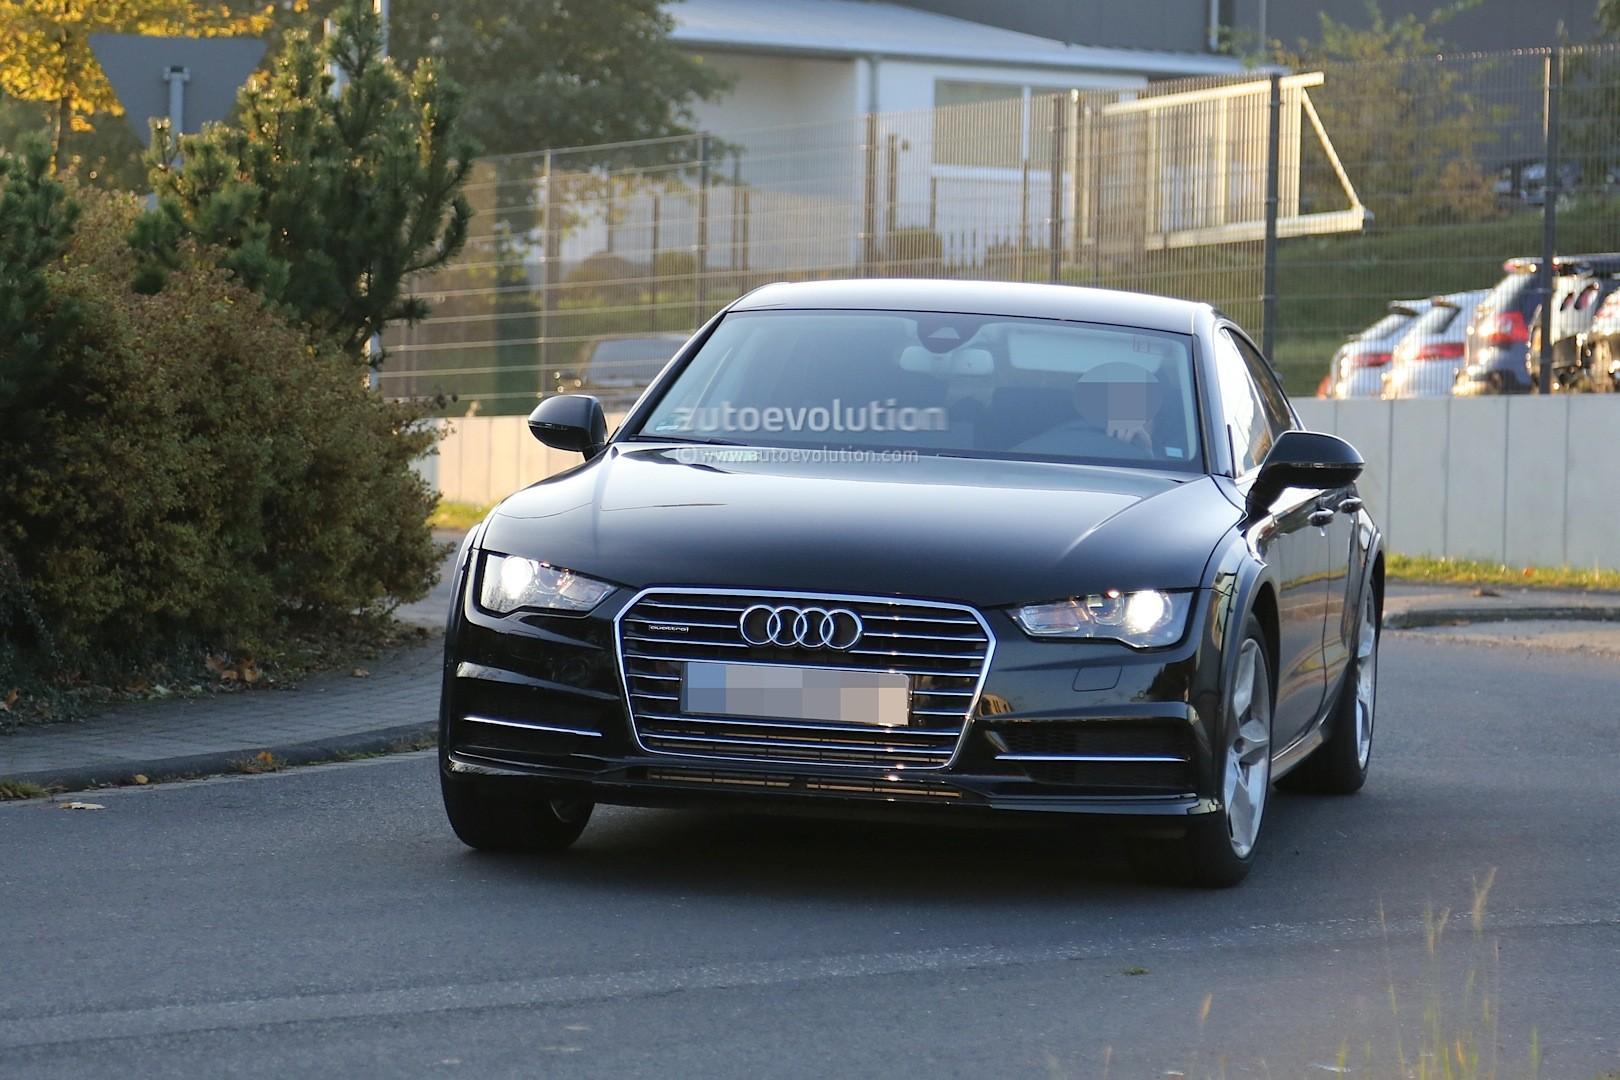 2018 Audi A7 Test Mule Spy Photos